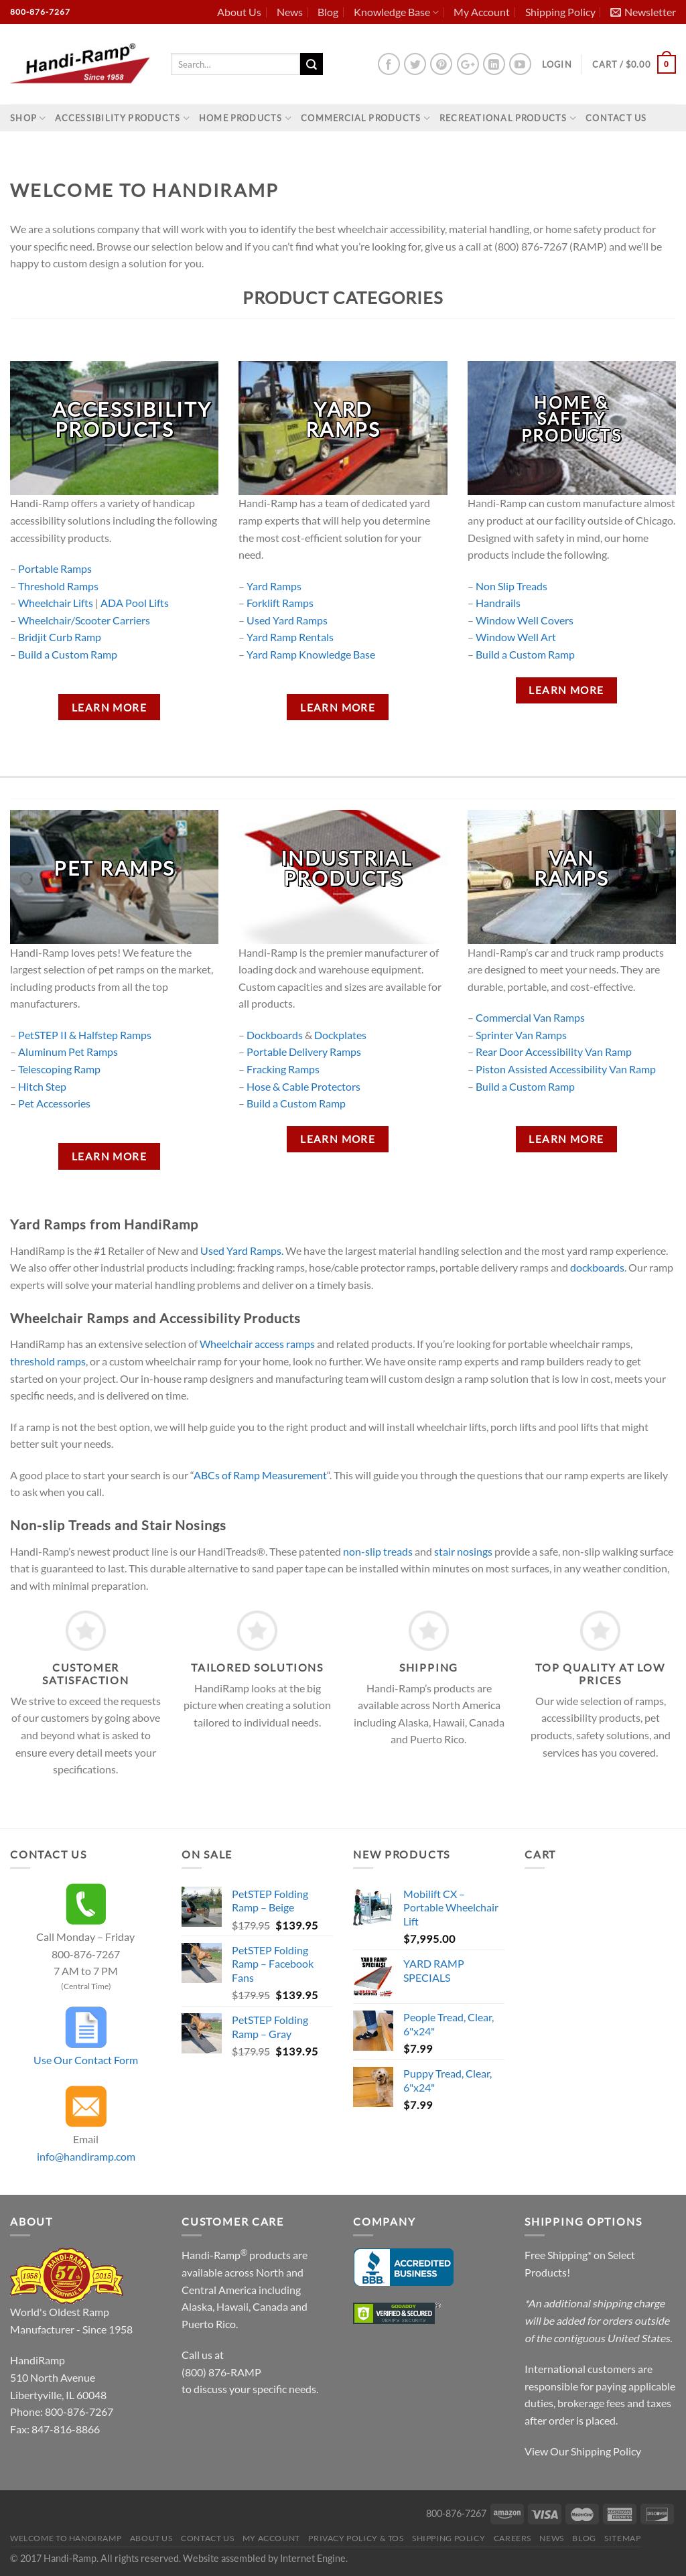 Handi-Ramp Competitors, Revenue and Employees - Owler Company Profile